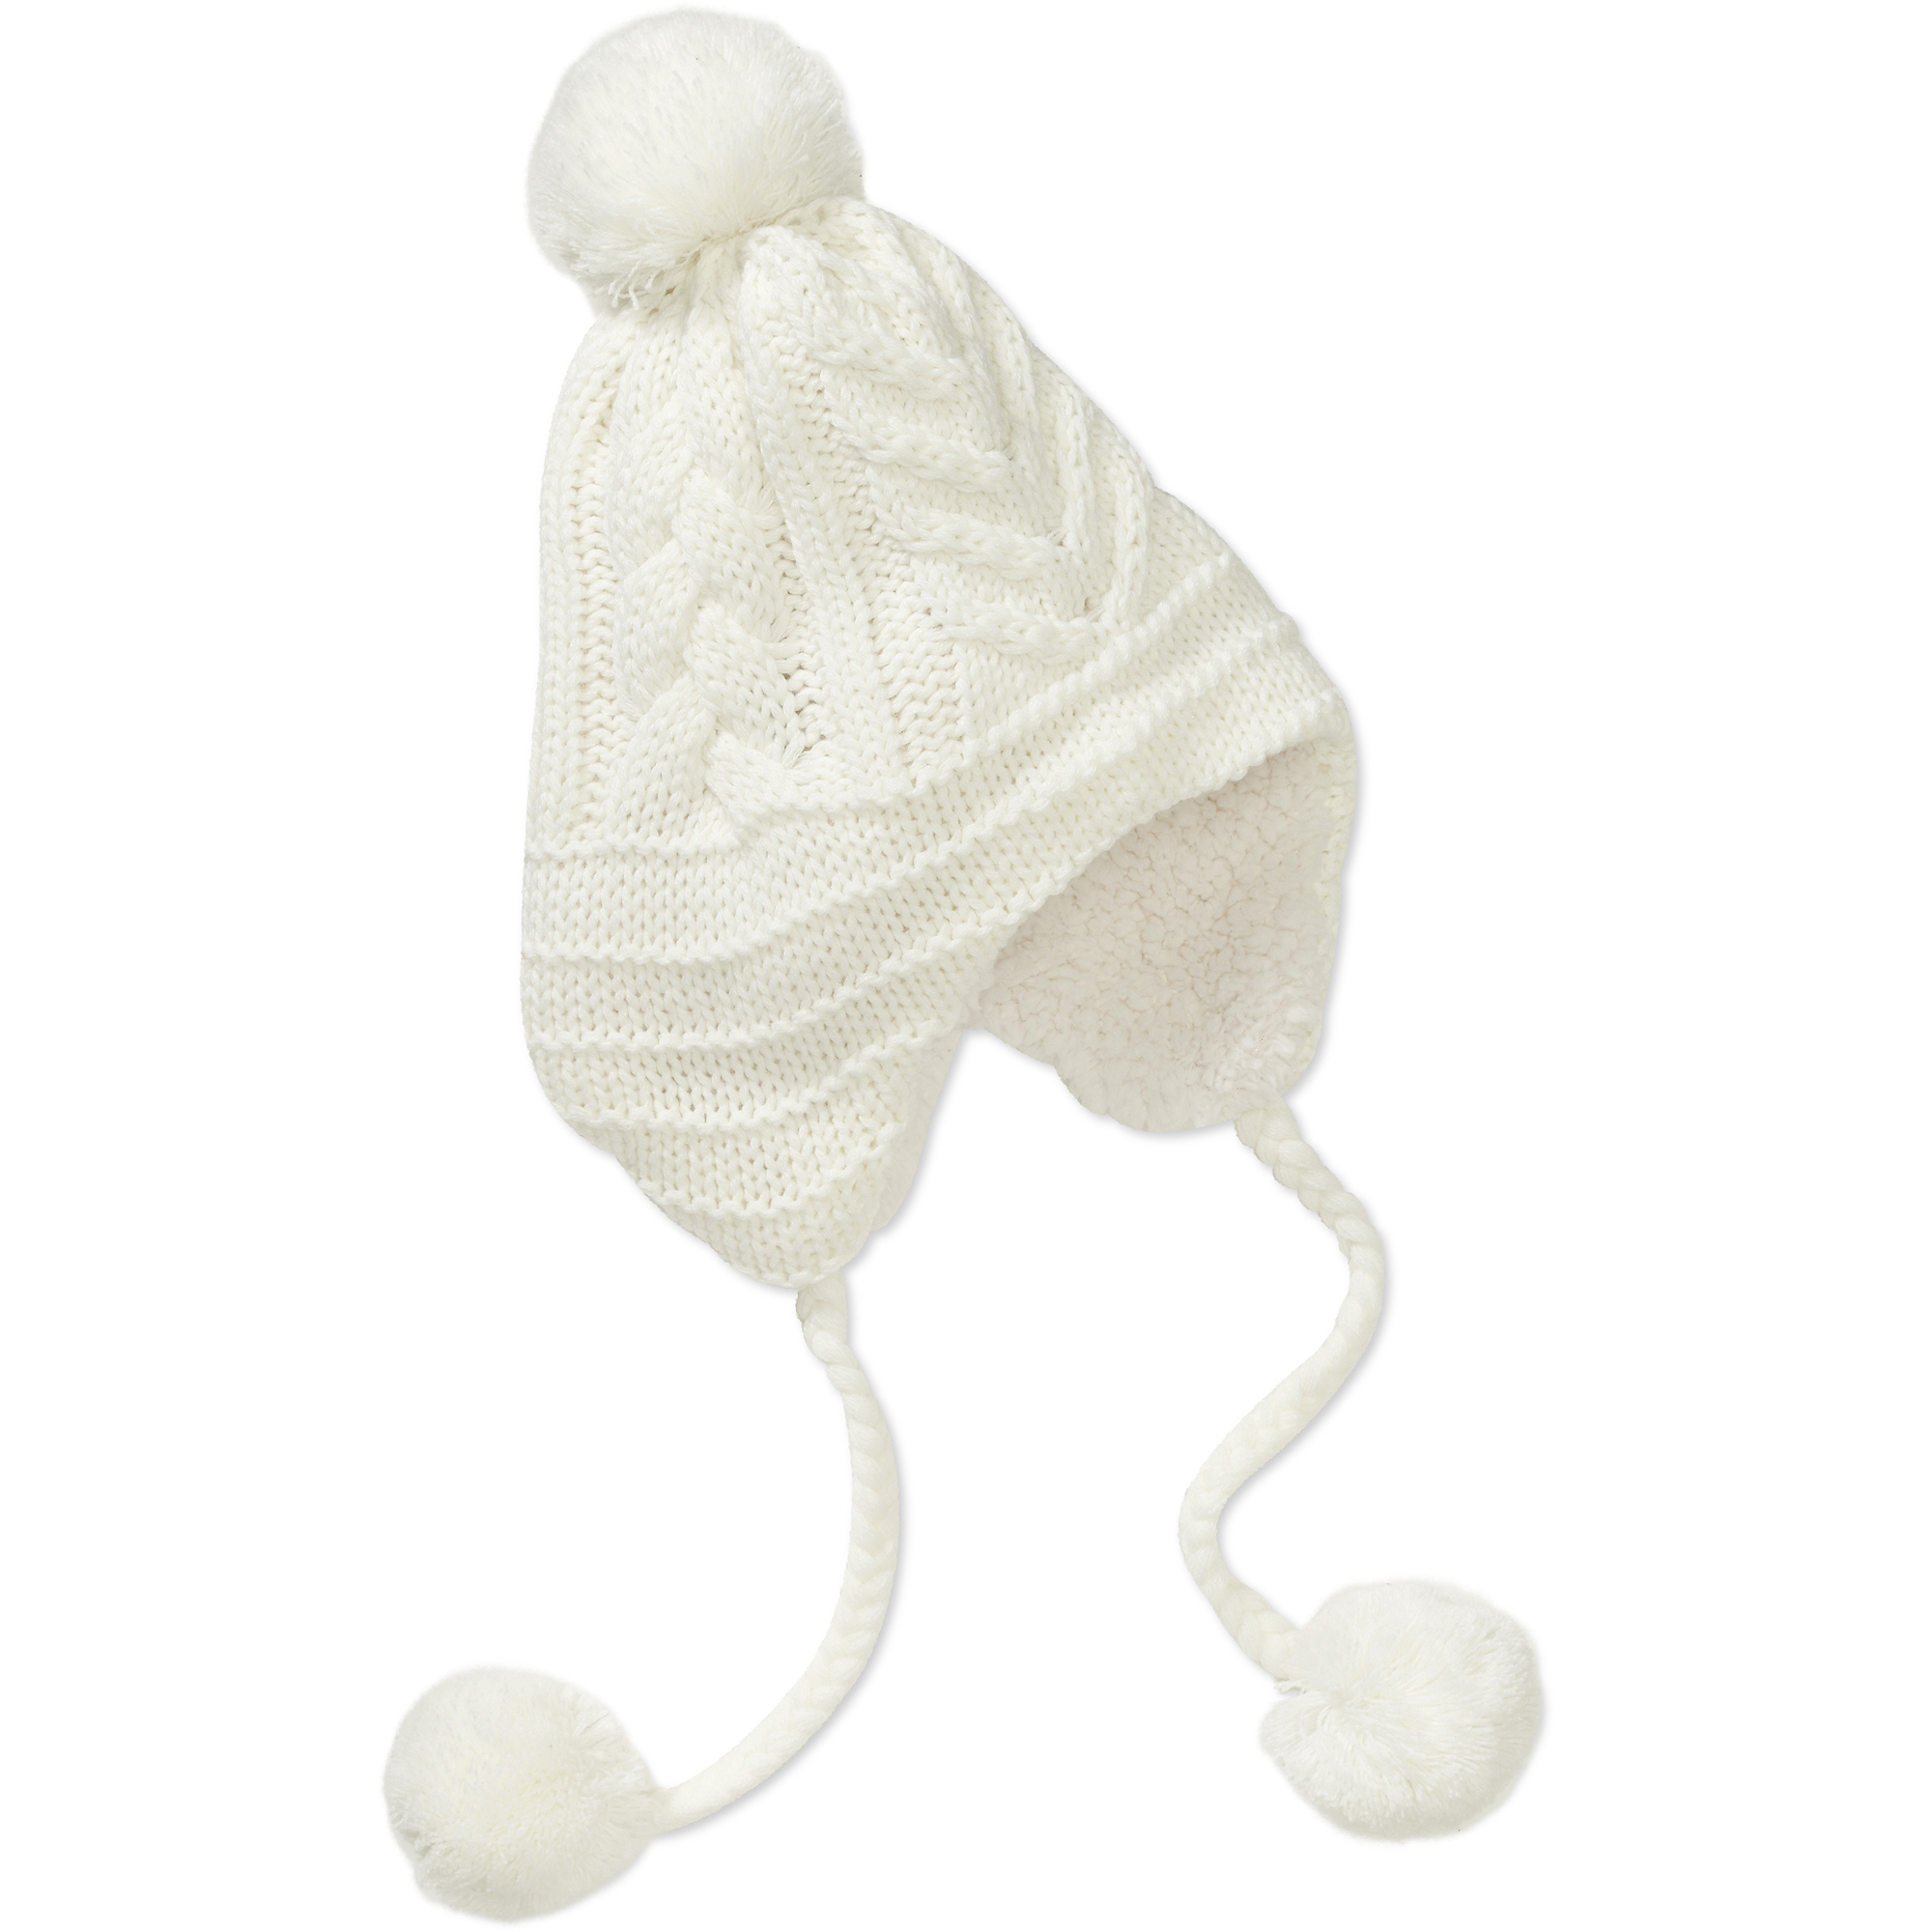 Dearfoams Women's Chunky Cable Earflap Hat with Faux-Sherpa Lining